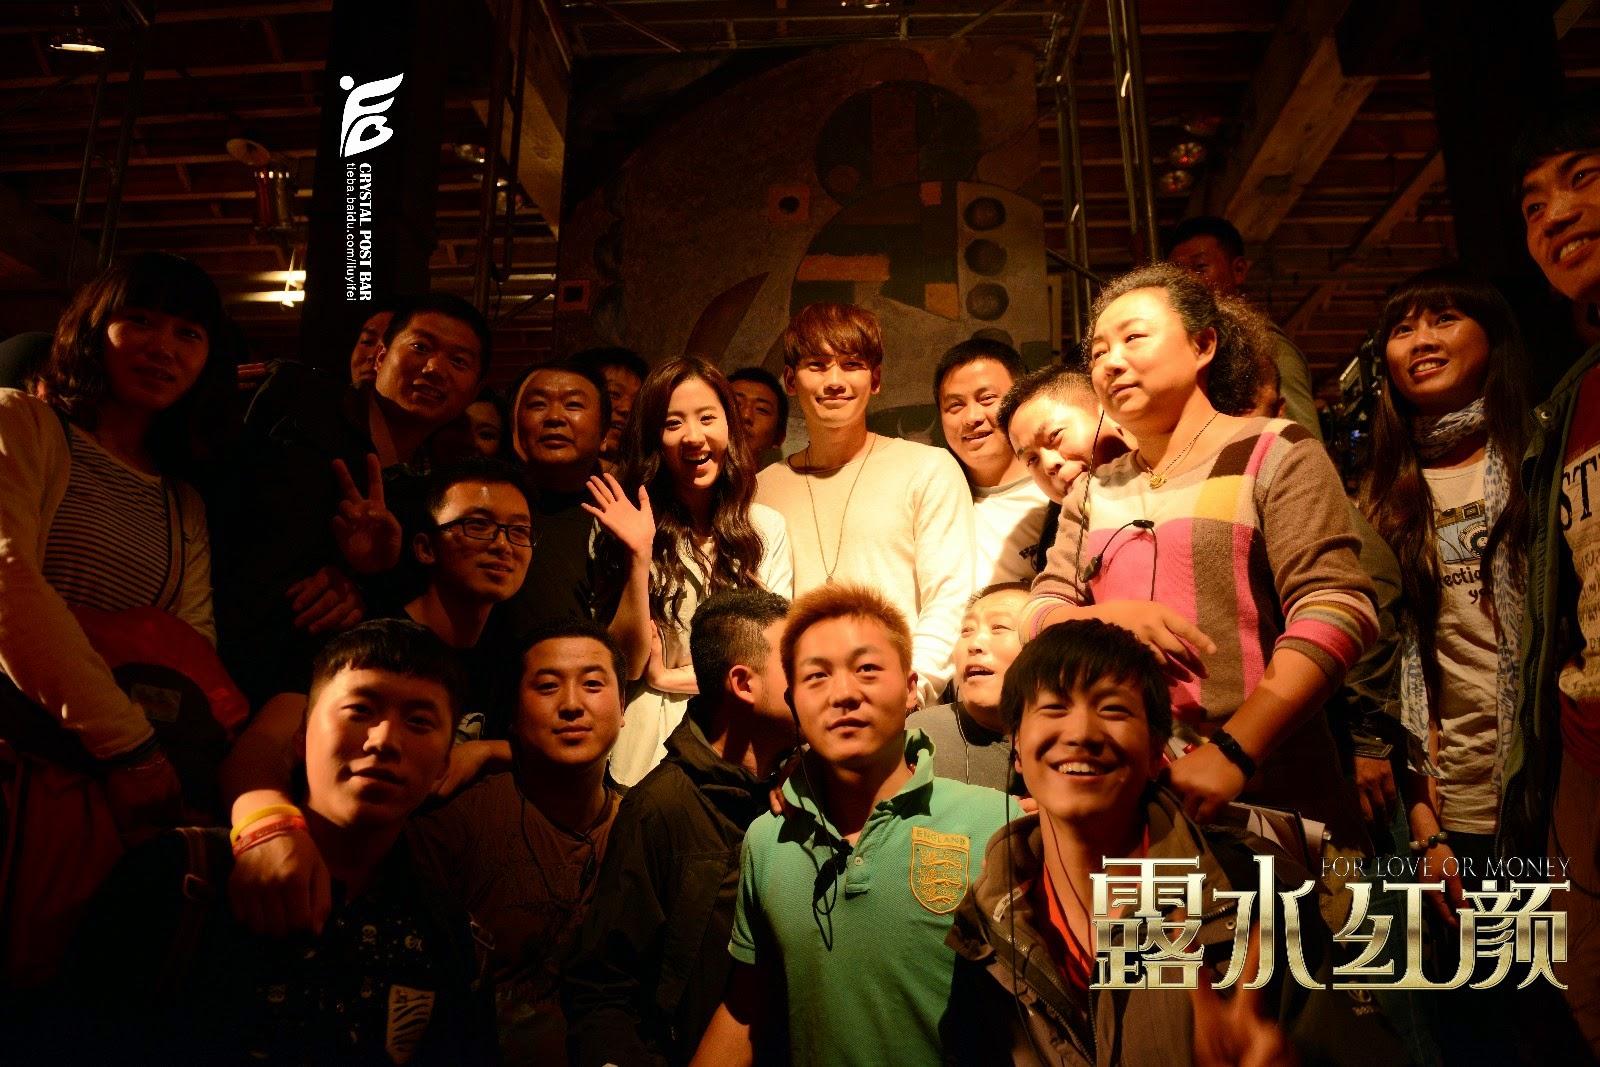 Rain 中国映画 露水紅顔_c0047605_8104249.jpg